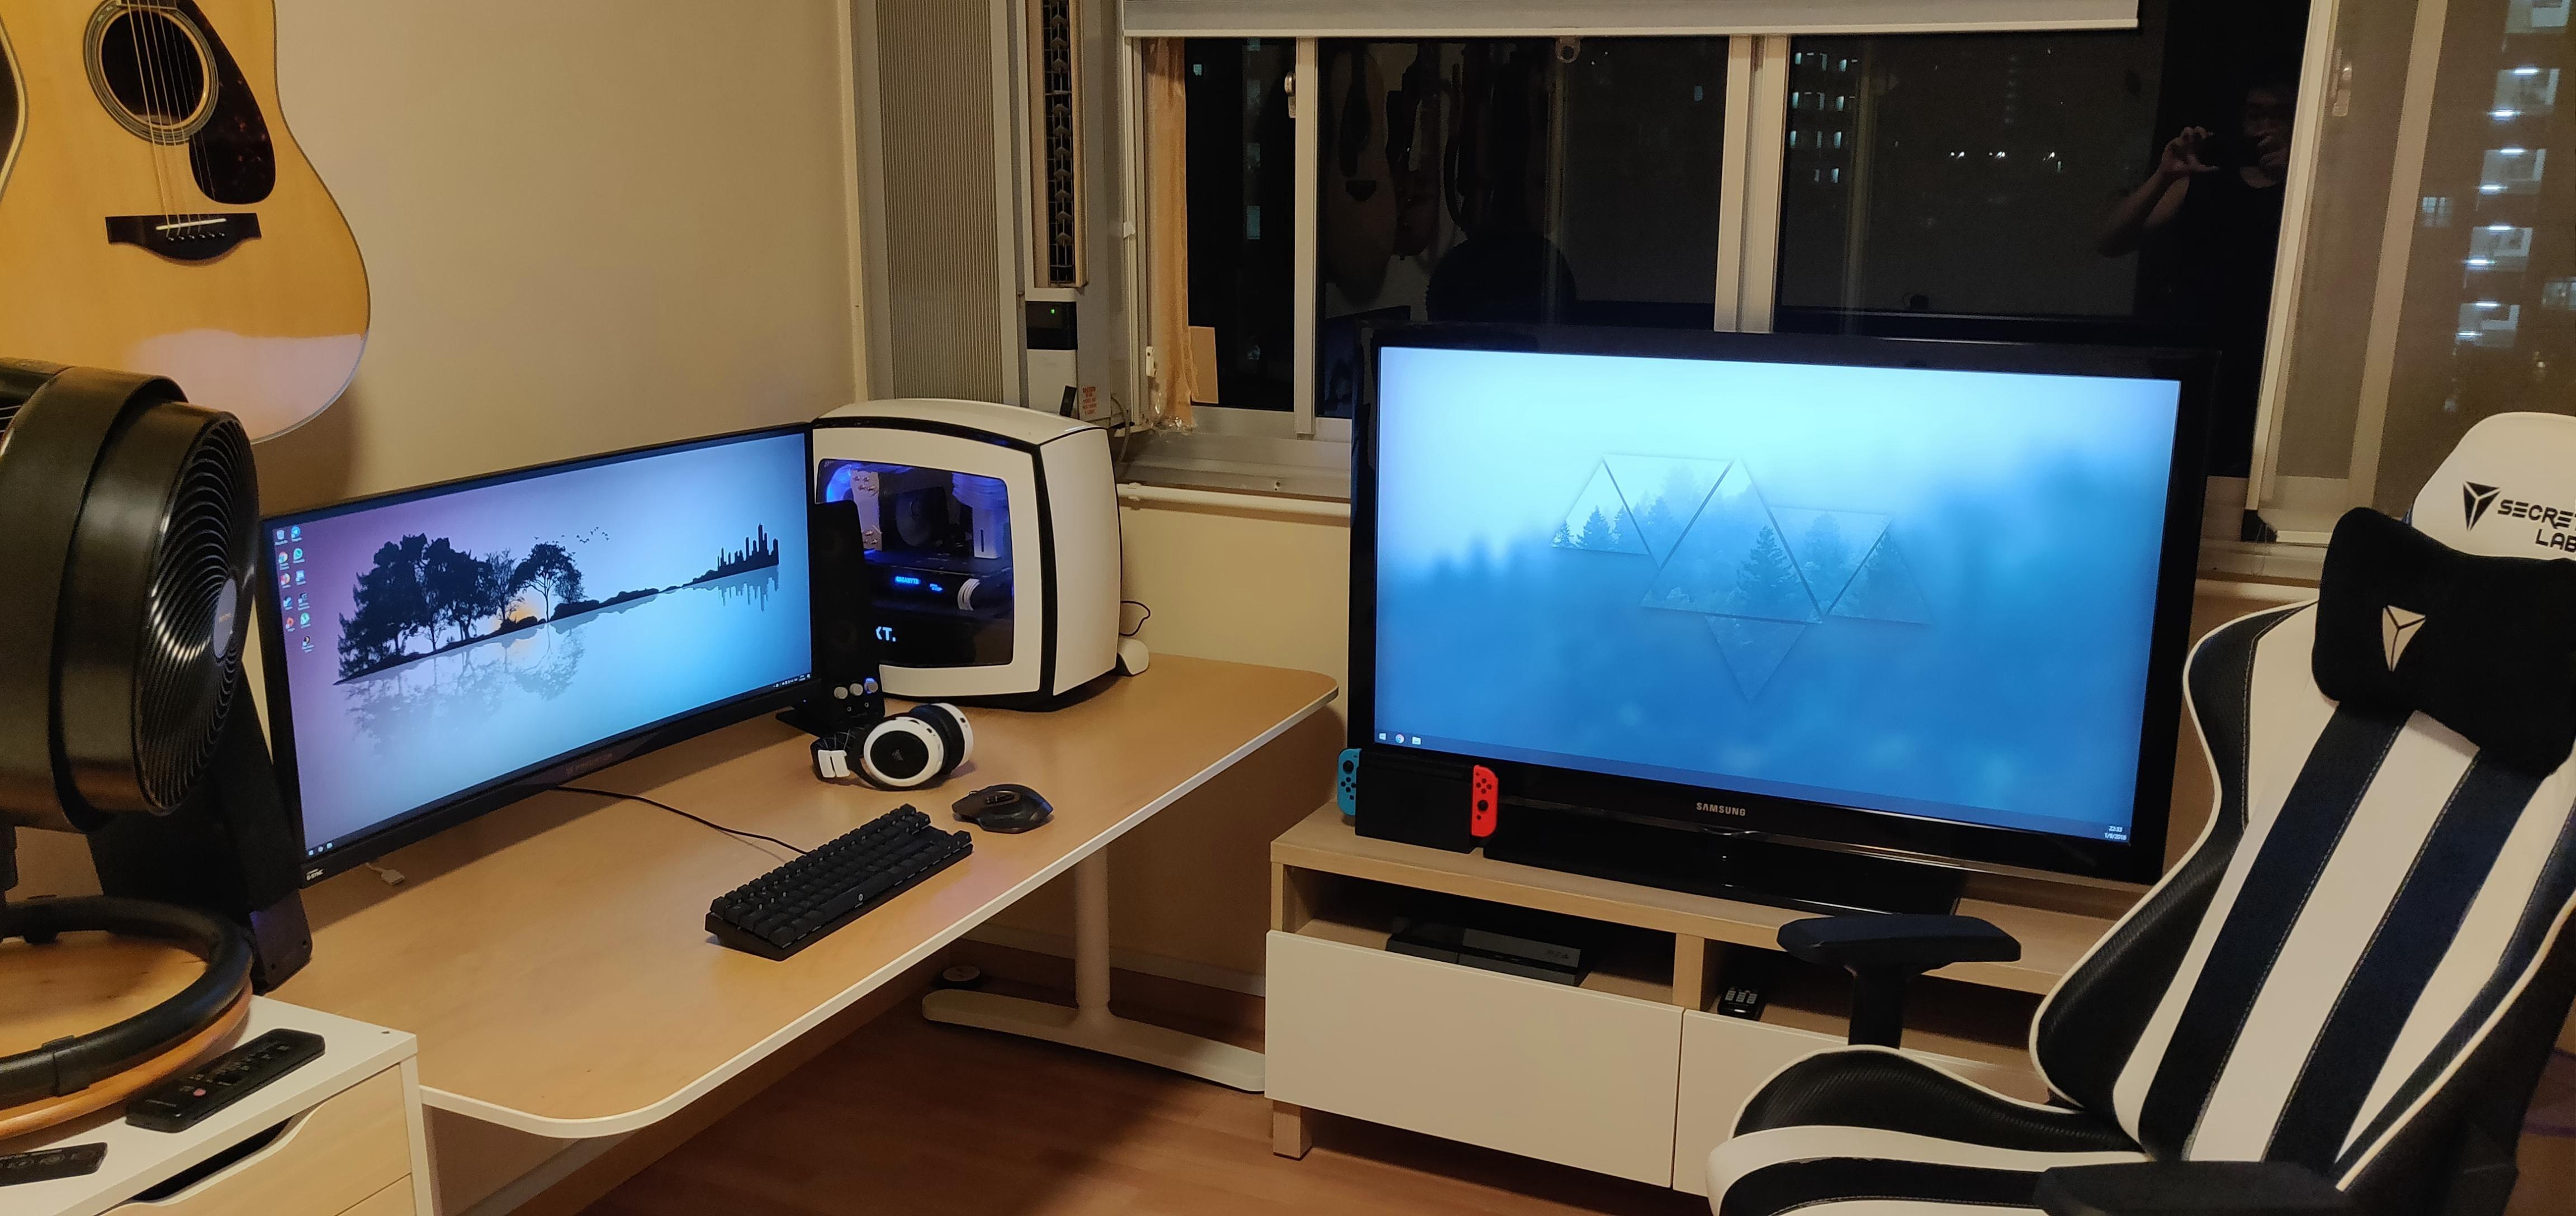 Added Old Hd Tv To Battlestation Battlestation Hdtv Office Setup